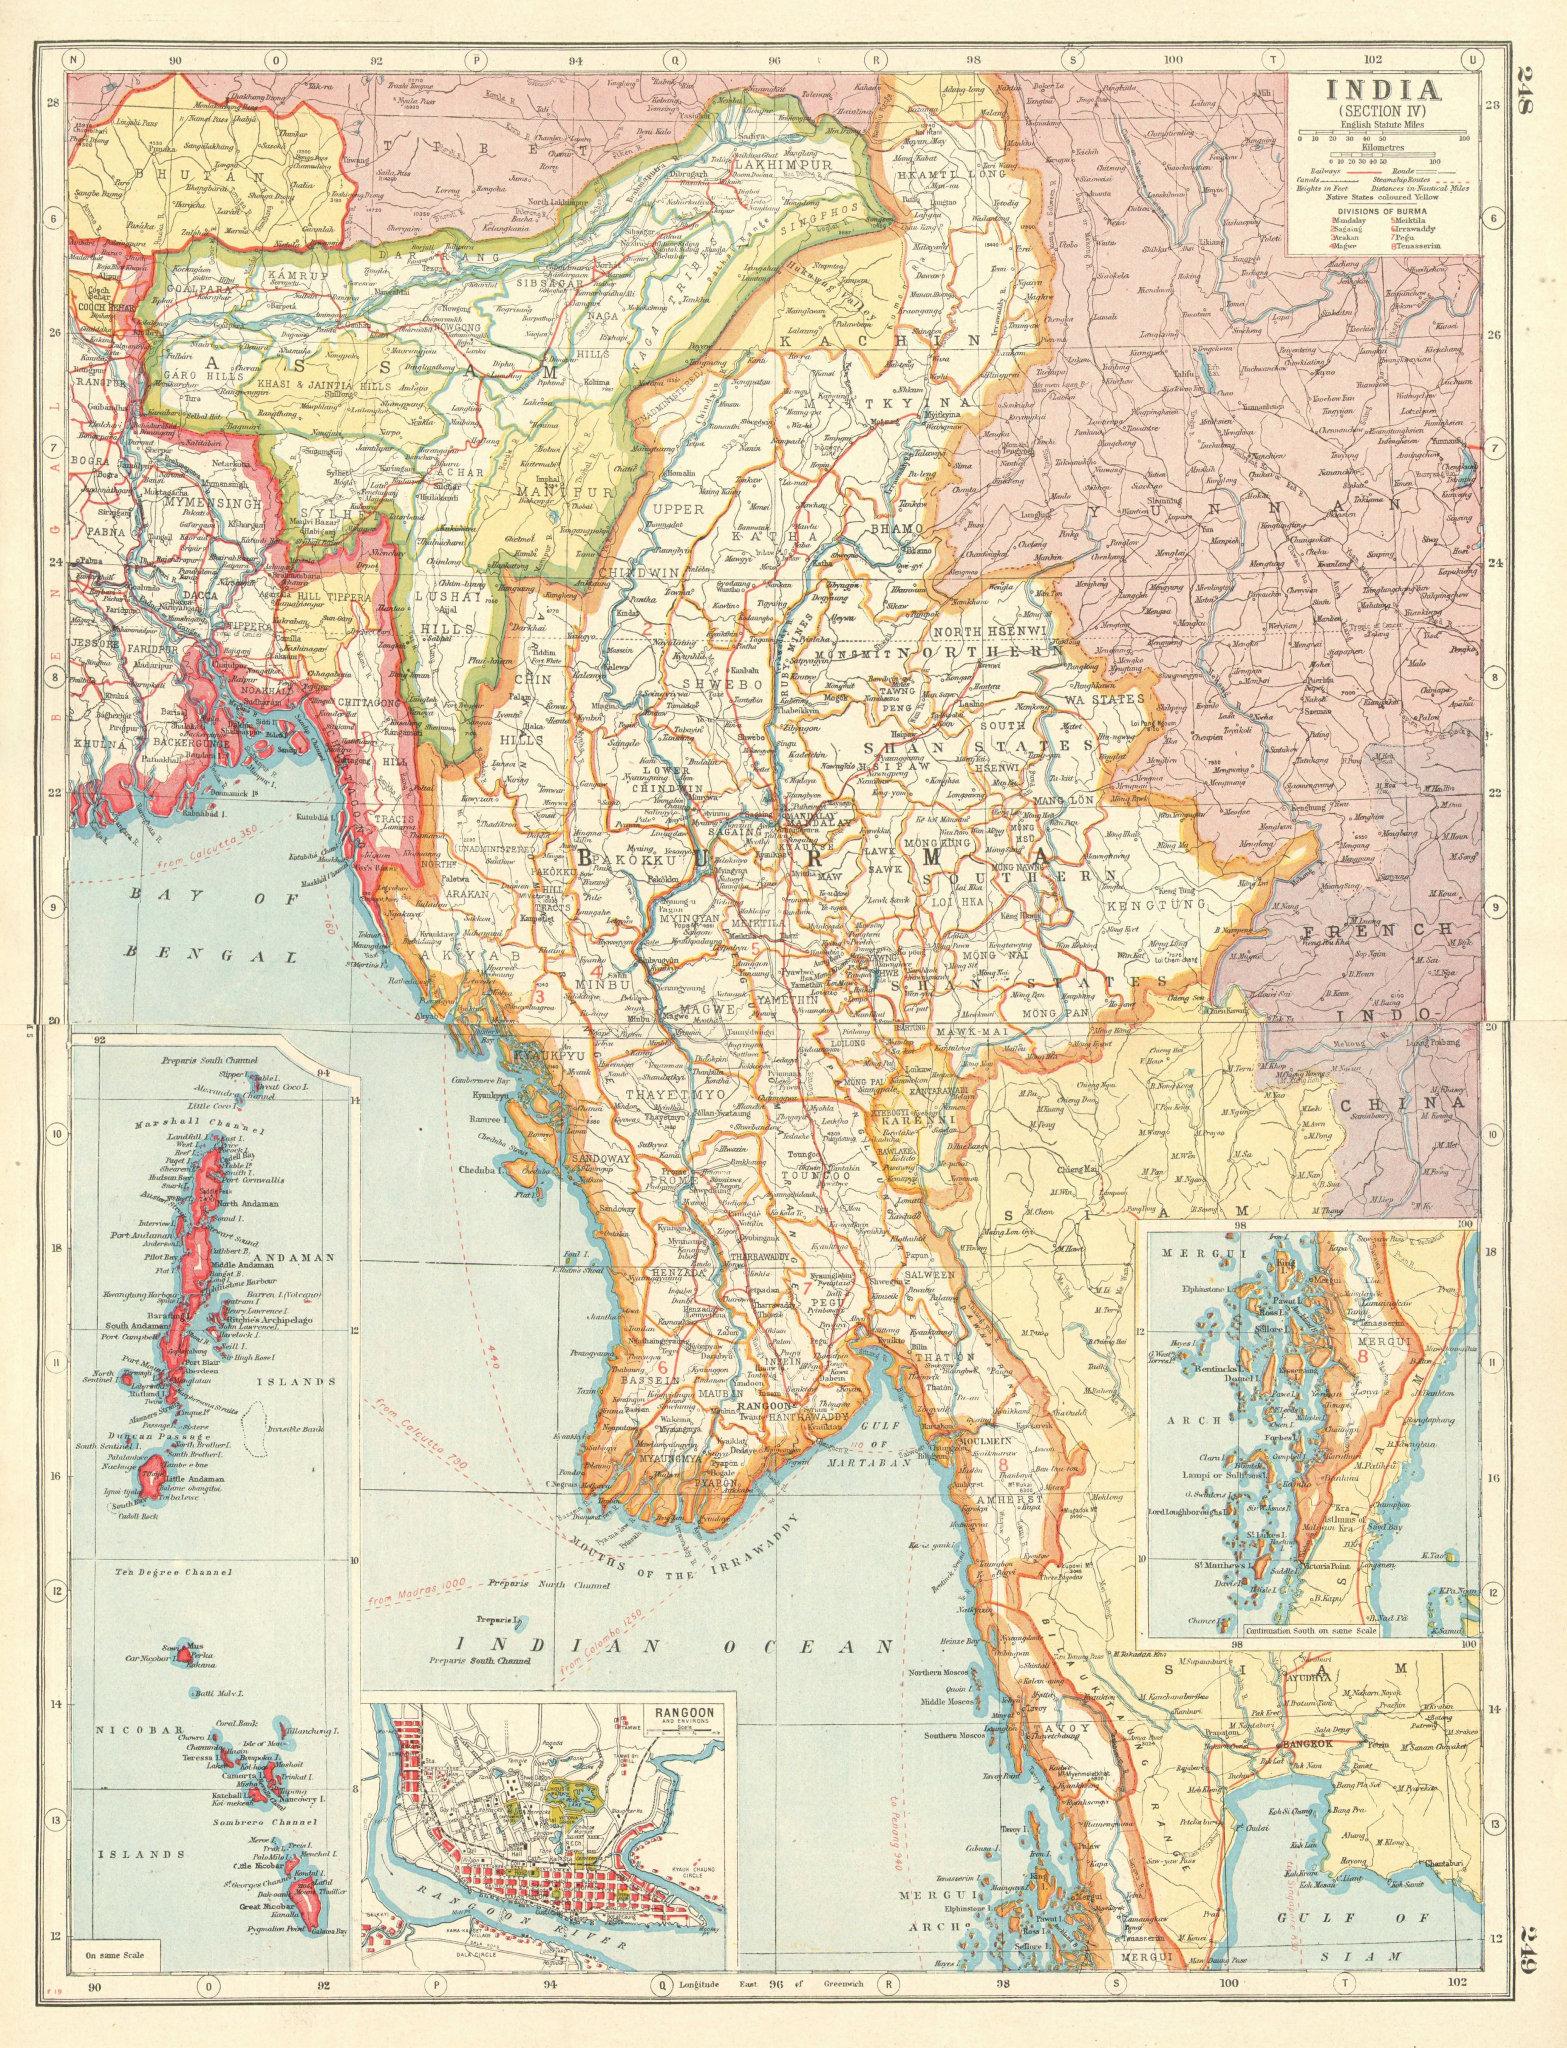 Associate Product BURMA MYANMAR. inset Rangoon Mergui Andaman Nicobar Islands 1920 old map